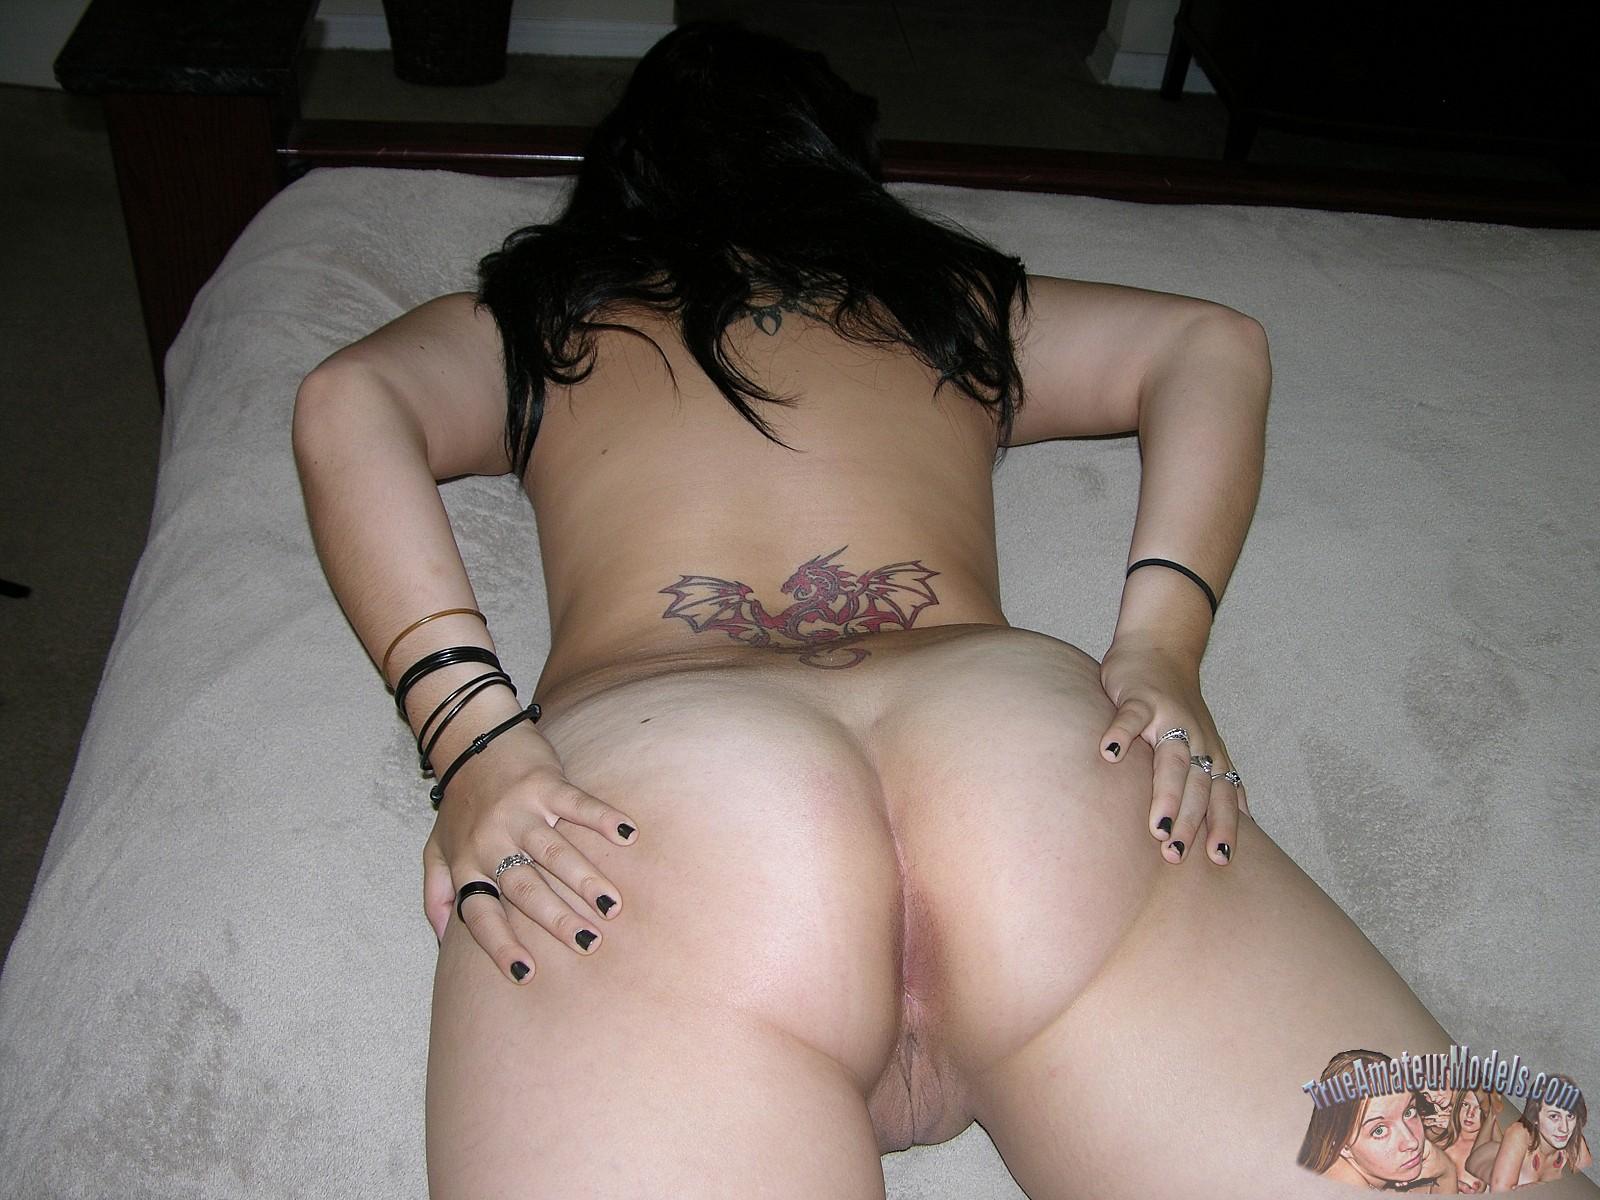 Nude Italian Amateur Katrina Free Download Nude Photo Gallery